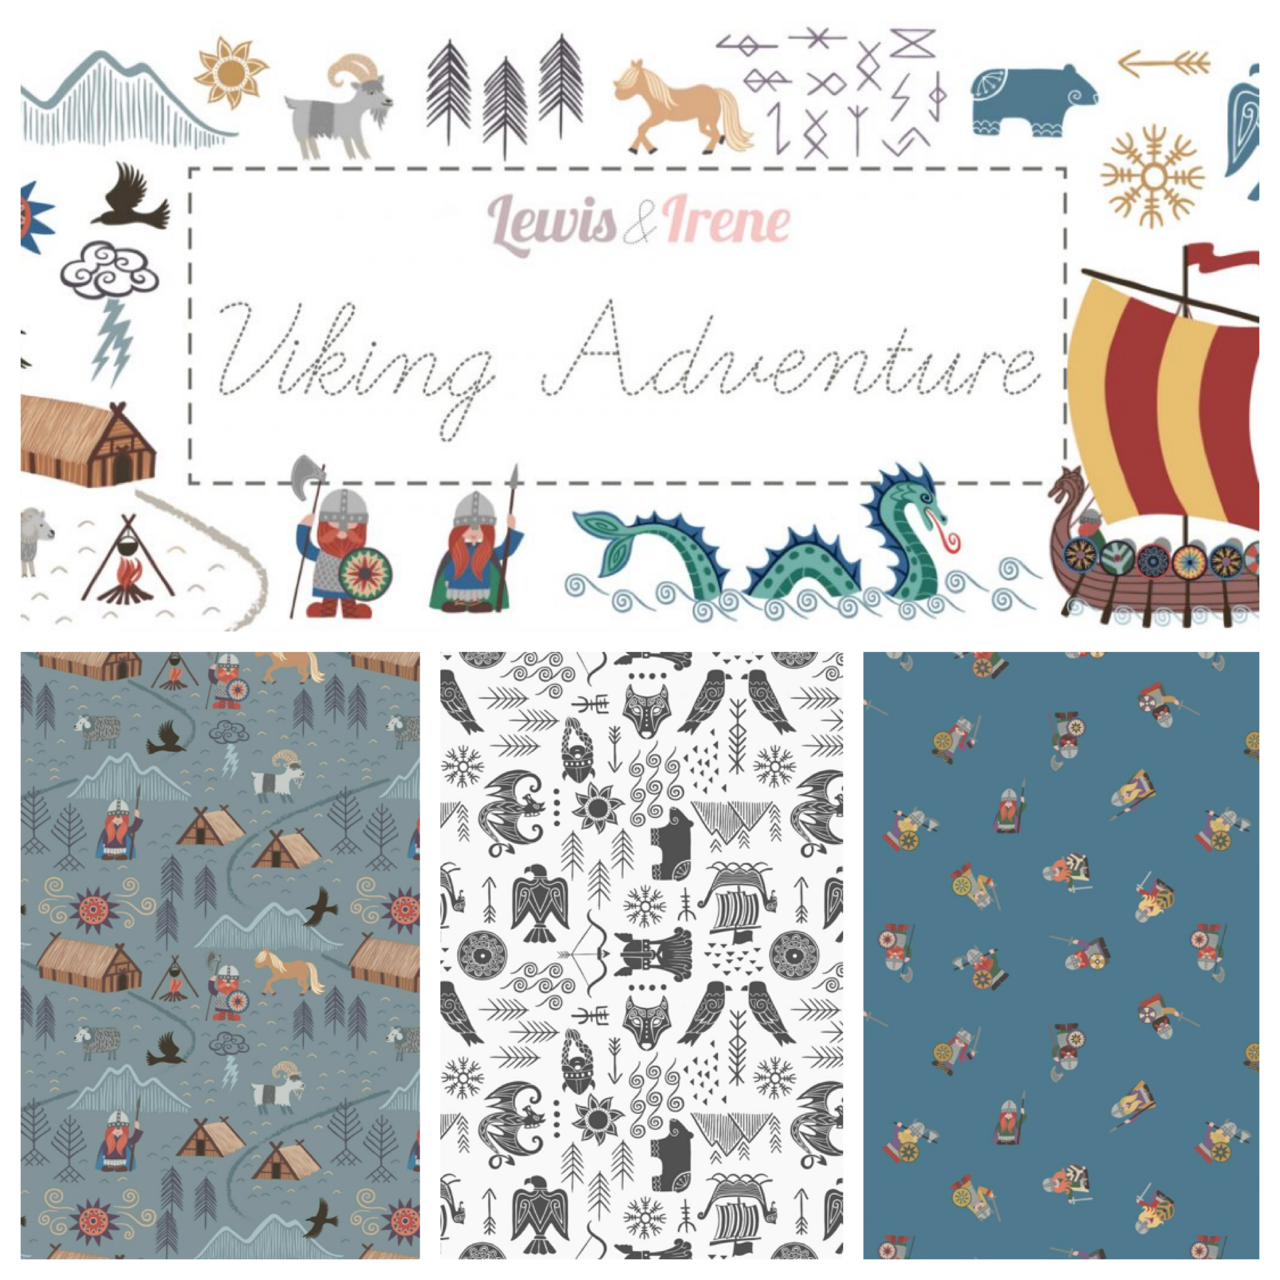 Lewis and Irene Viking fabric